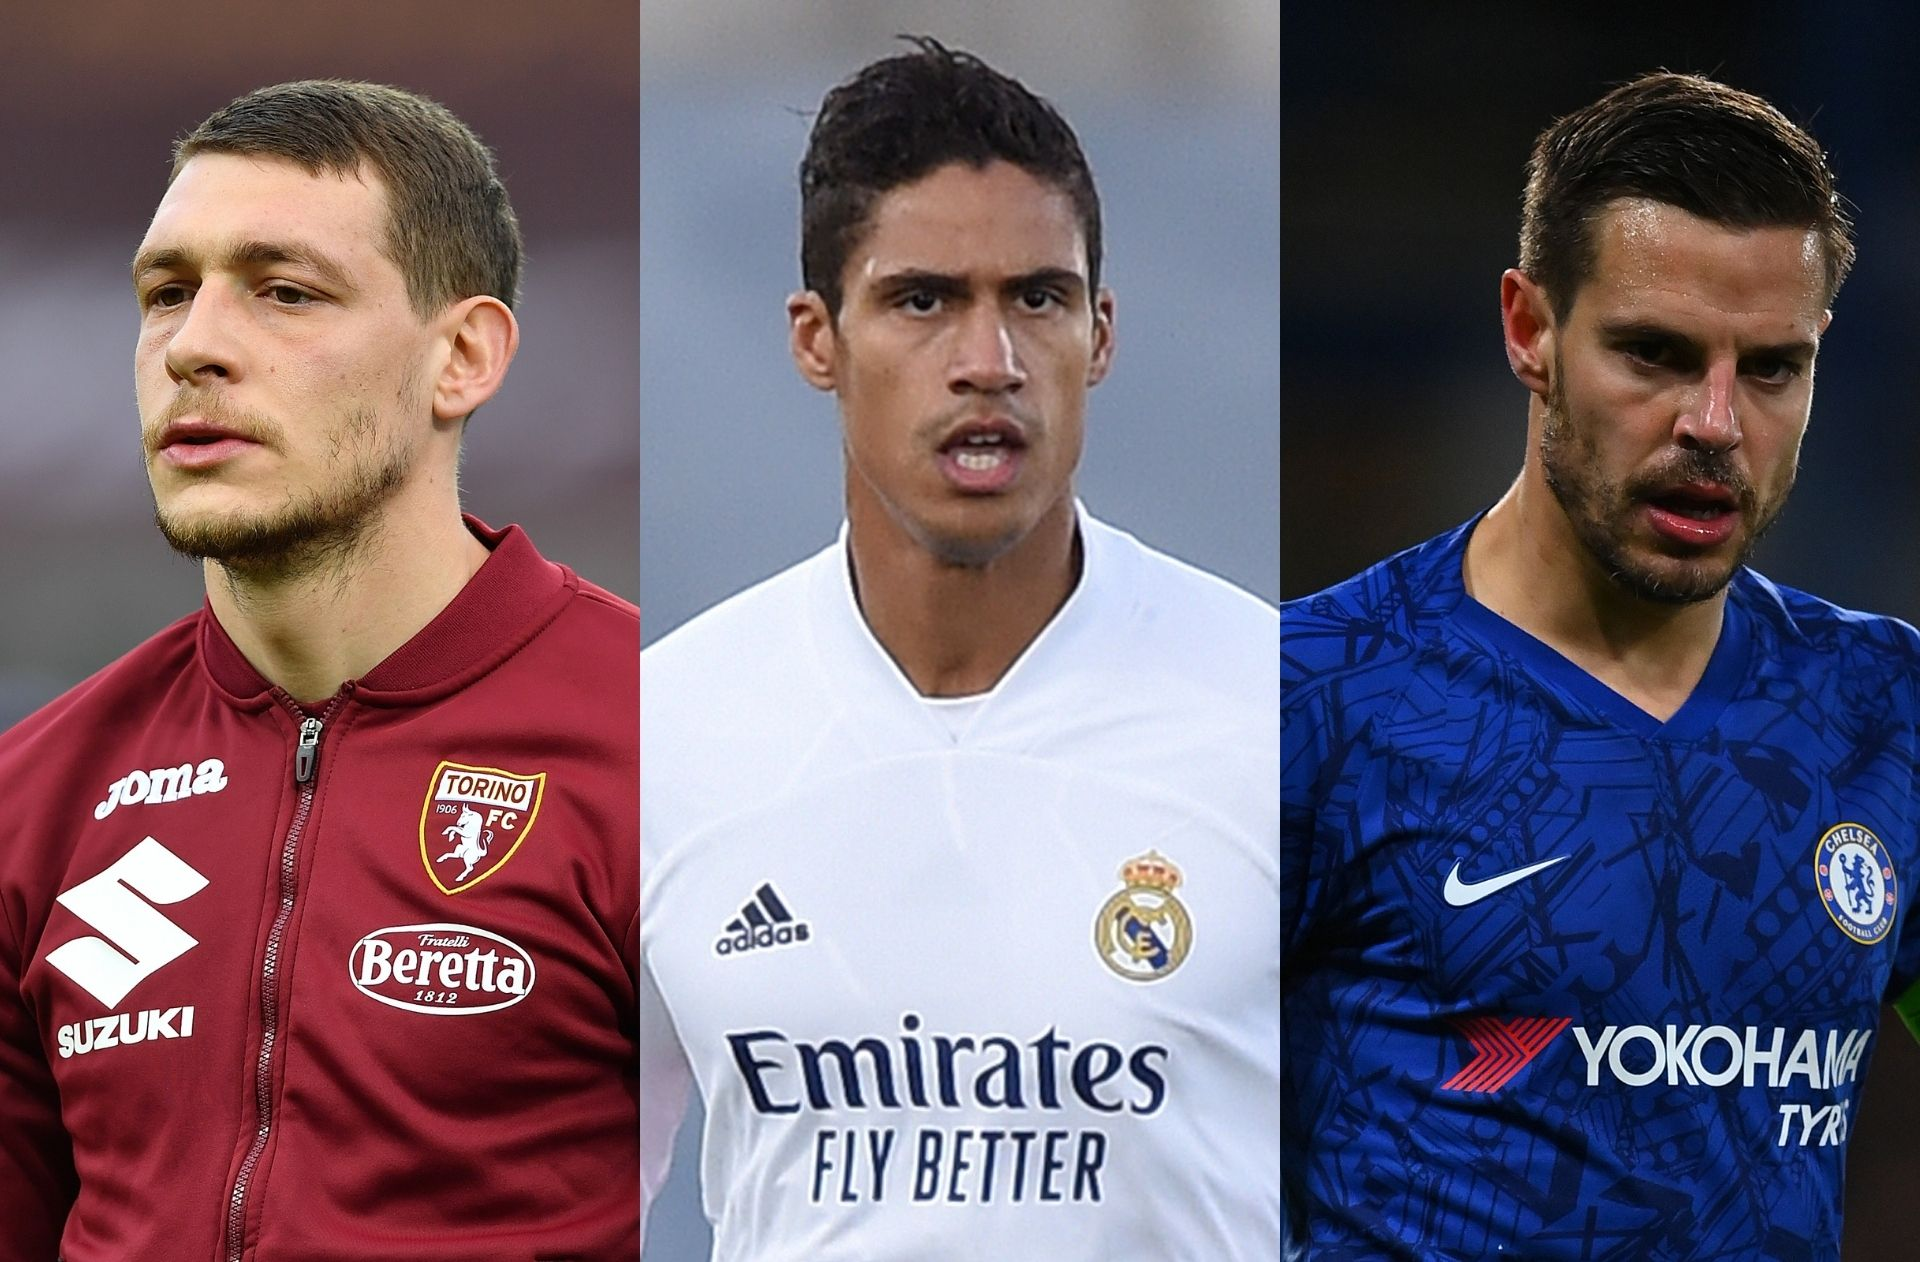 Monday's transfer rumors - Chelsea lead 3-way battle for Varane